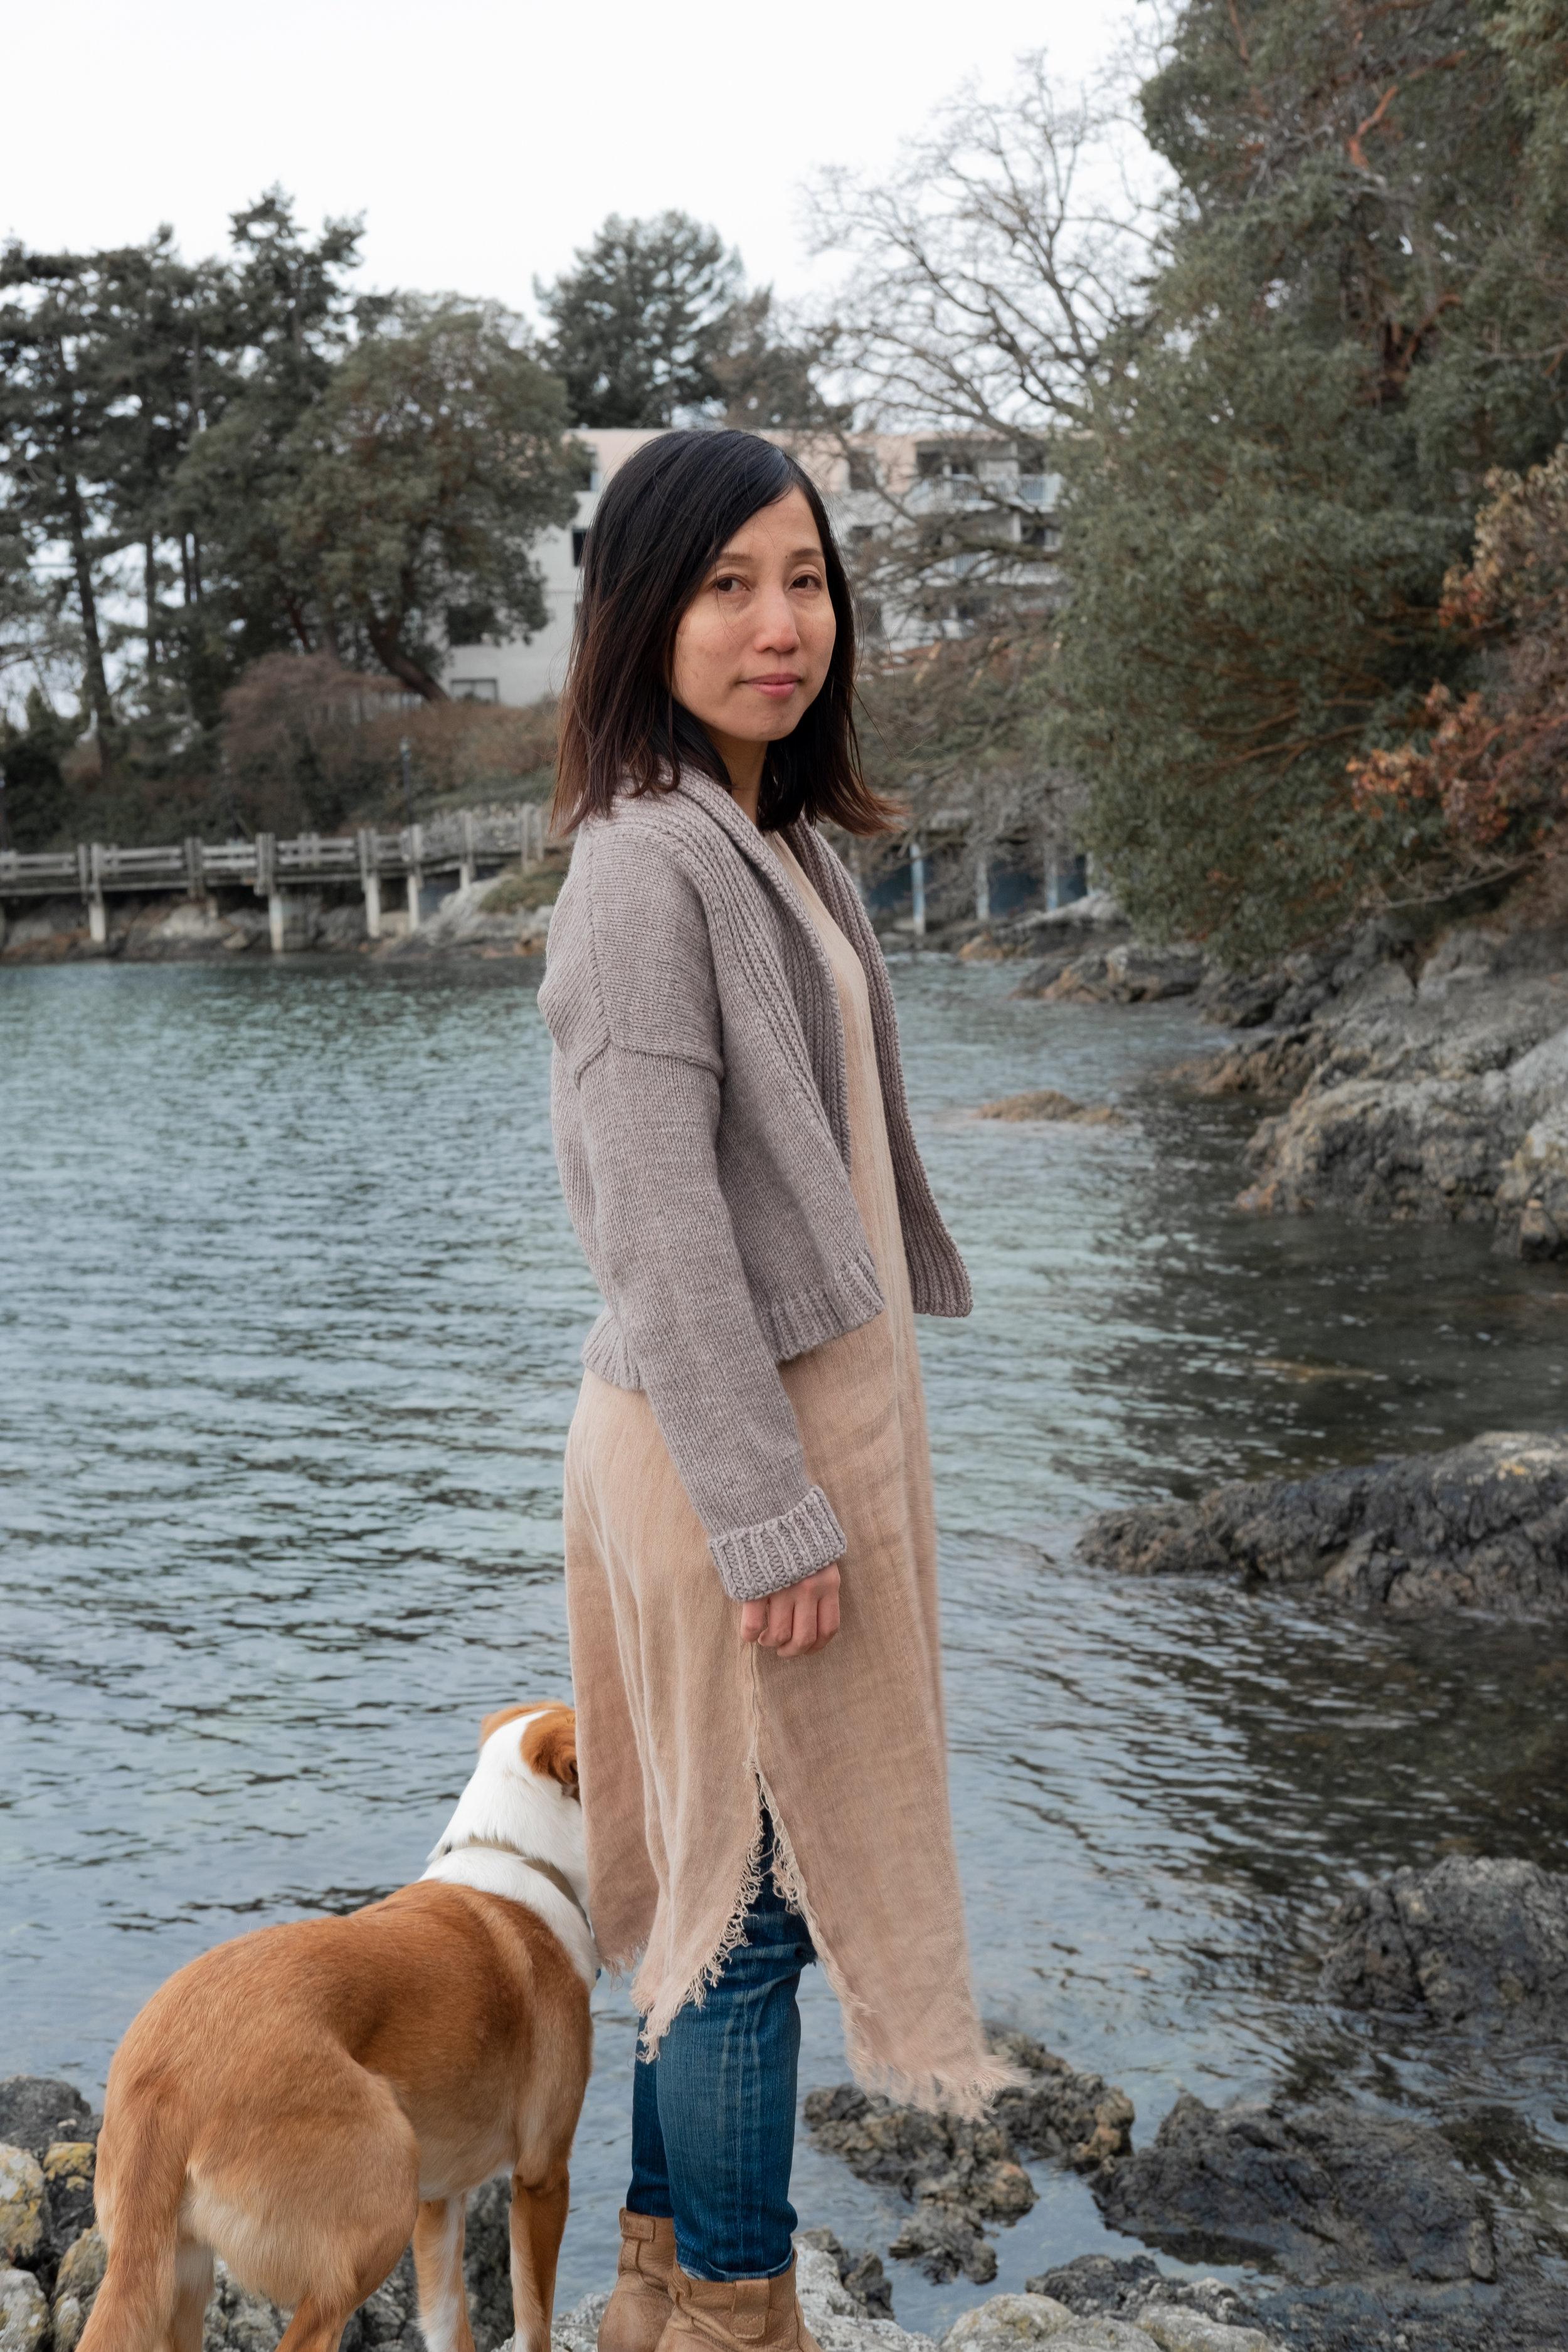 Suzu in natural Gilwell cardigan